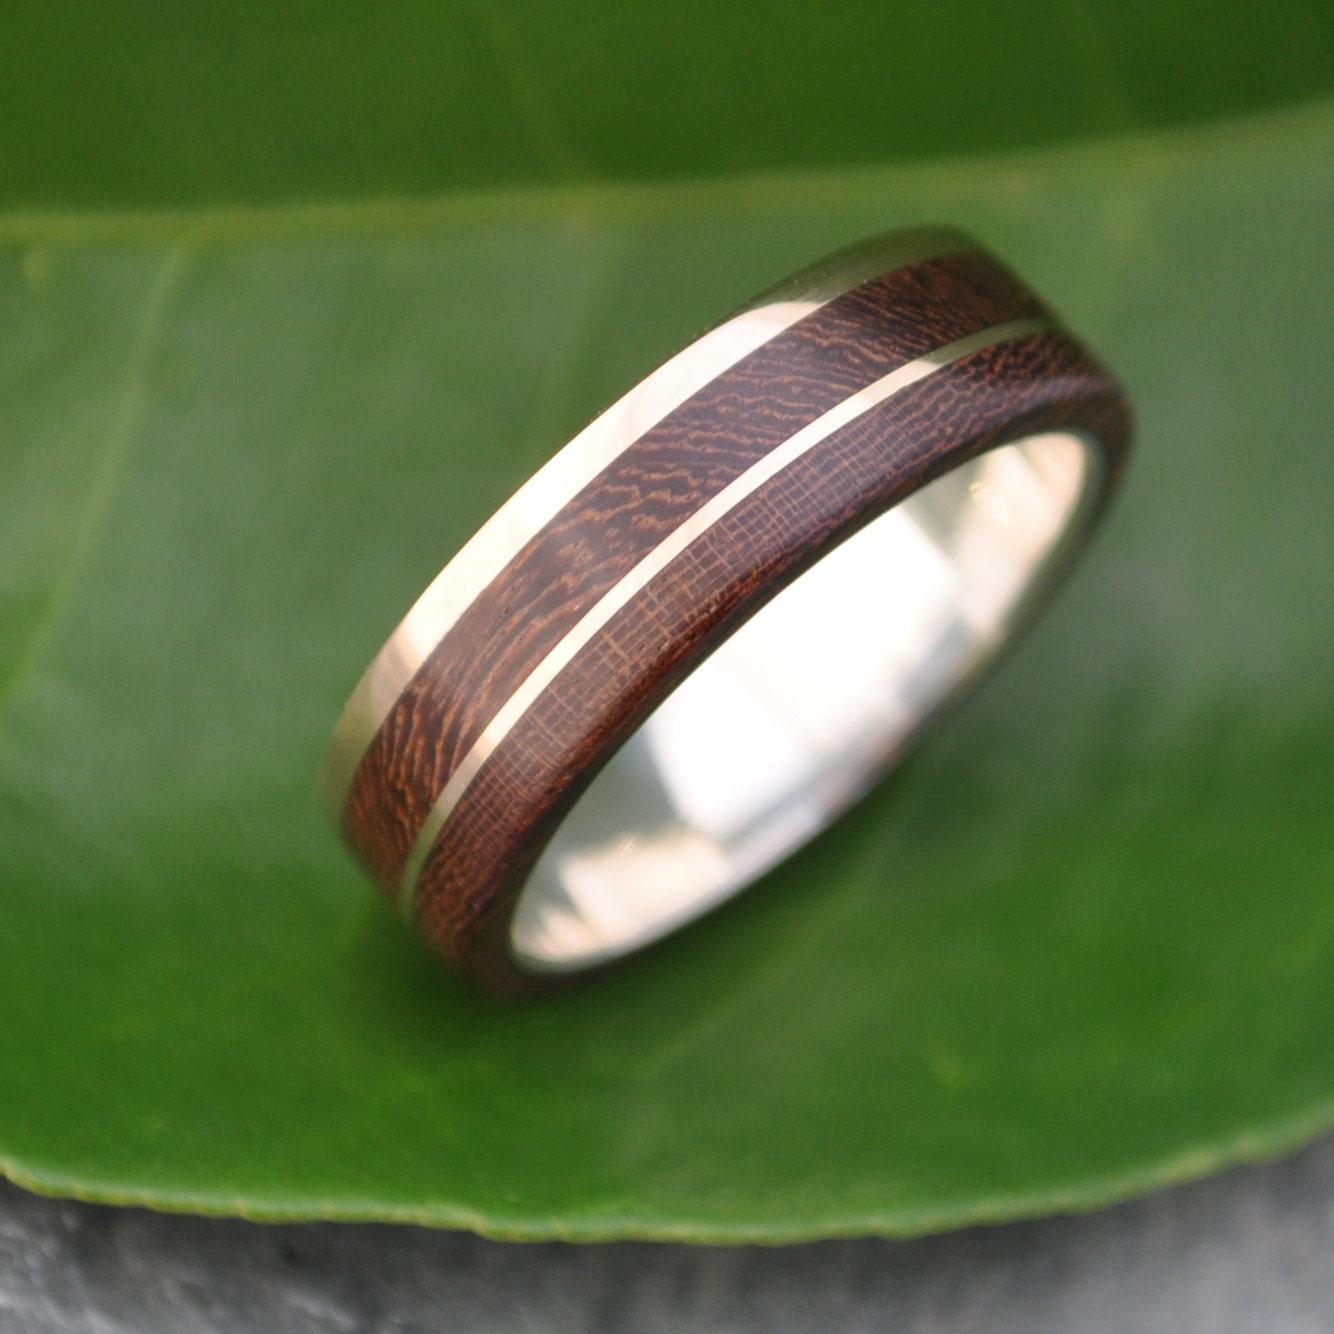 Gold and Silver Un Lado Asi Wood Ring ecofriendly 14k